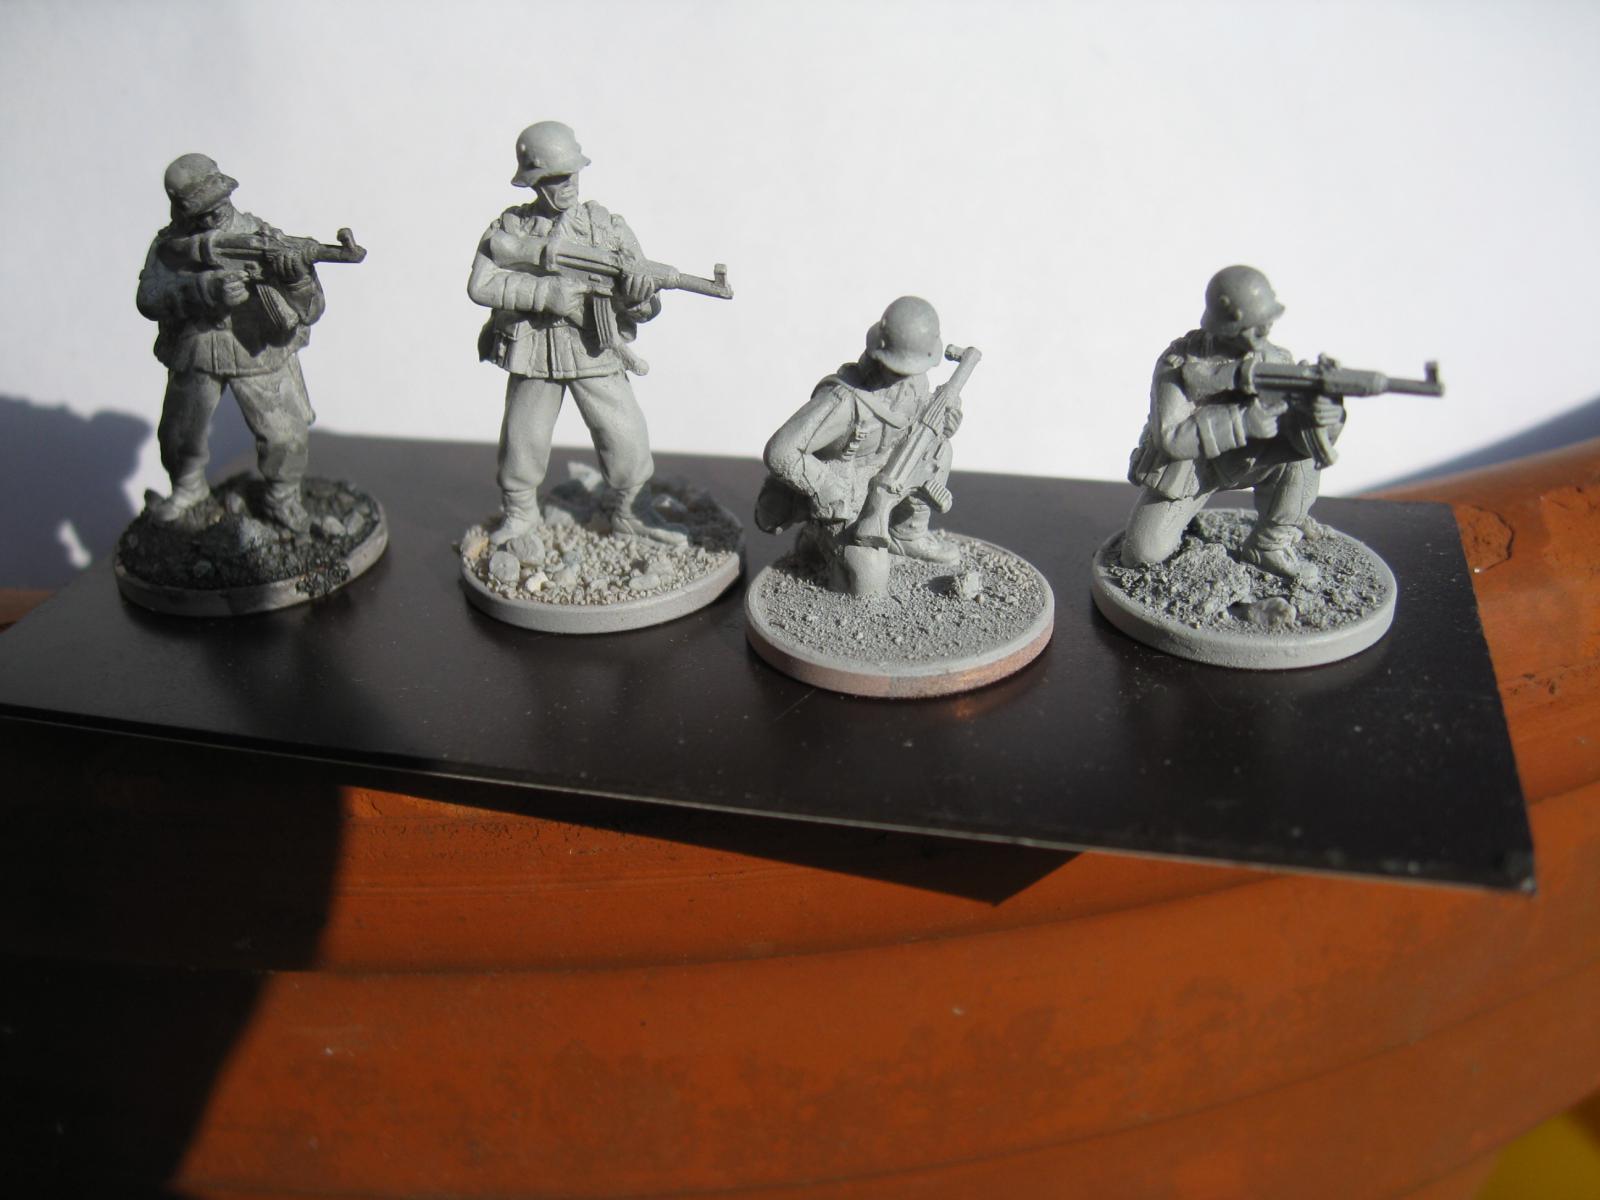 CP Models Miniatures - Seite 2 Kn1y-4h-6c4b